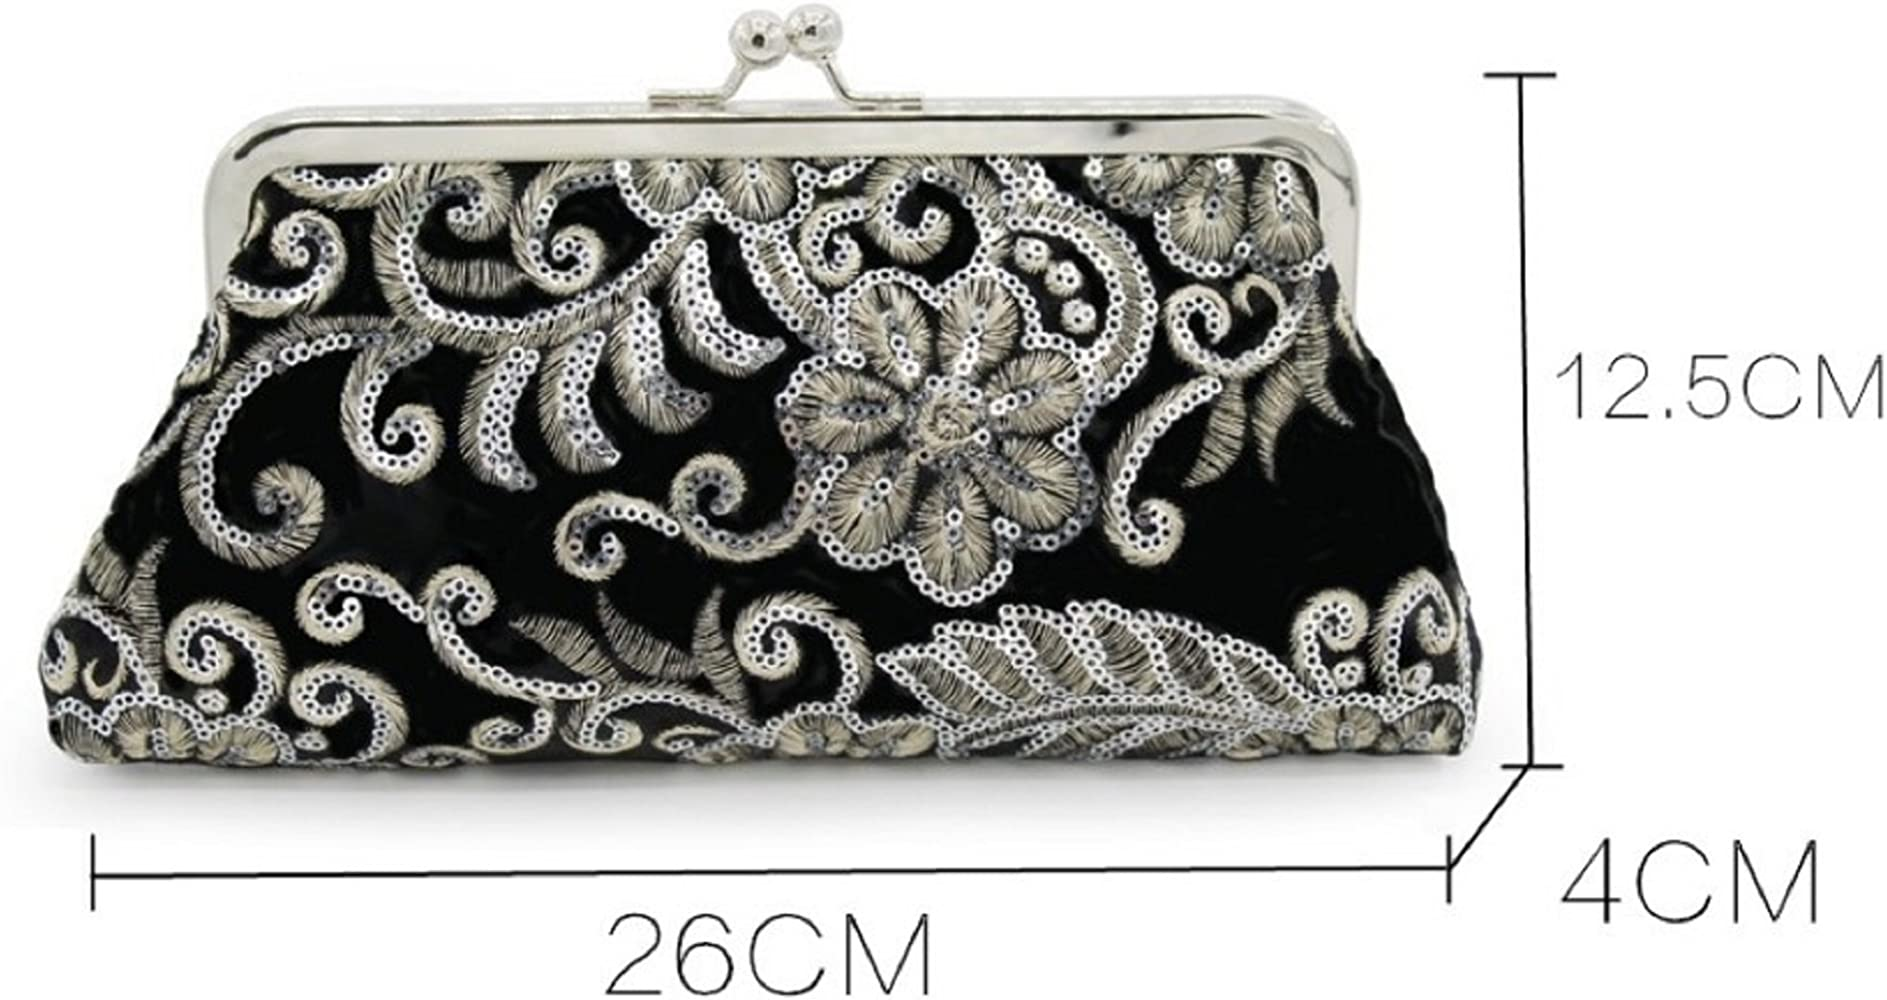 Bettyhome Womens Elegant Retro Flower Beads Embroidery Handbag Clutch Evening Bag Purse